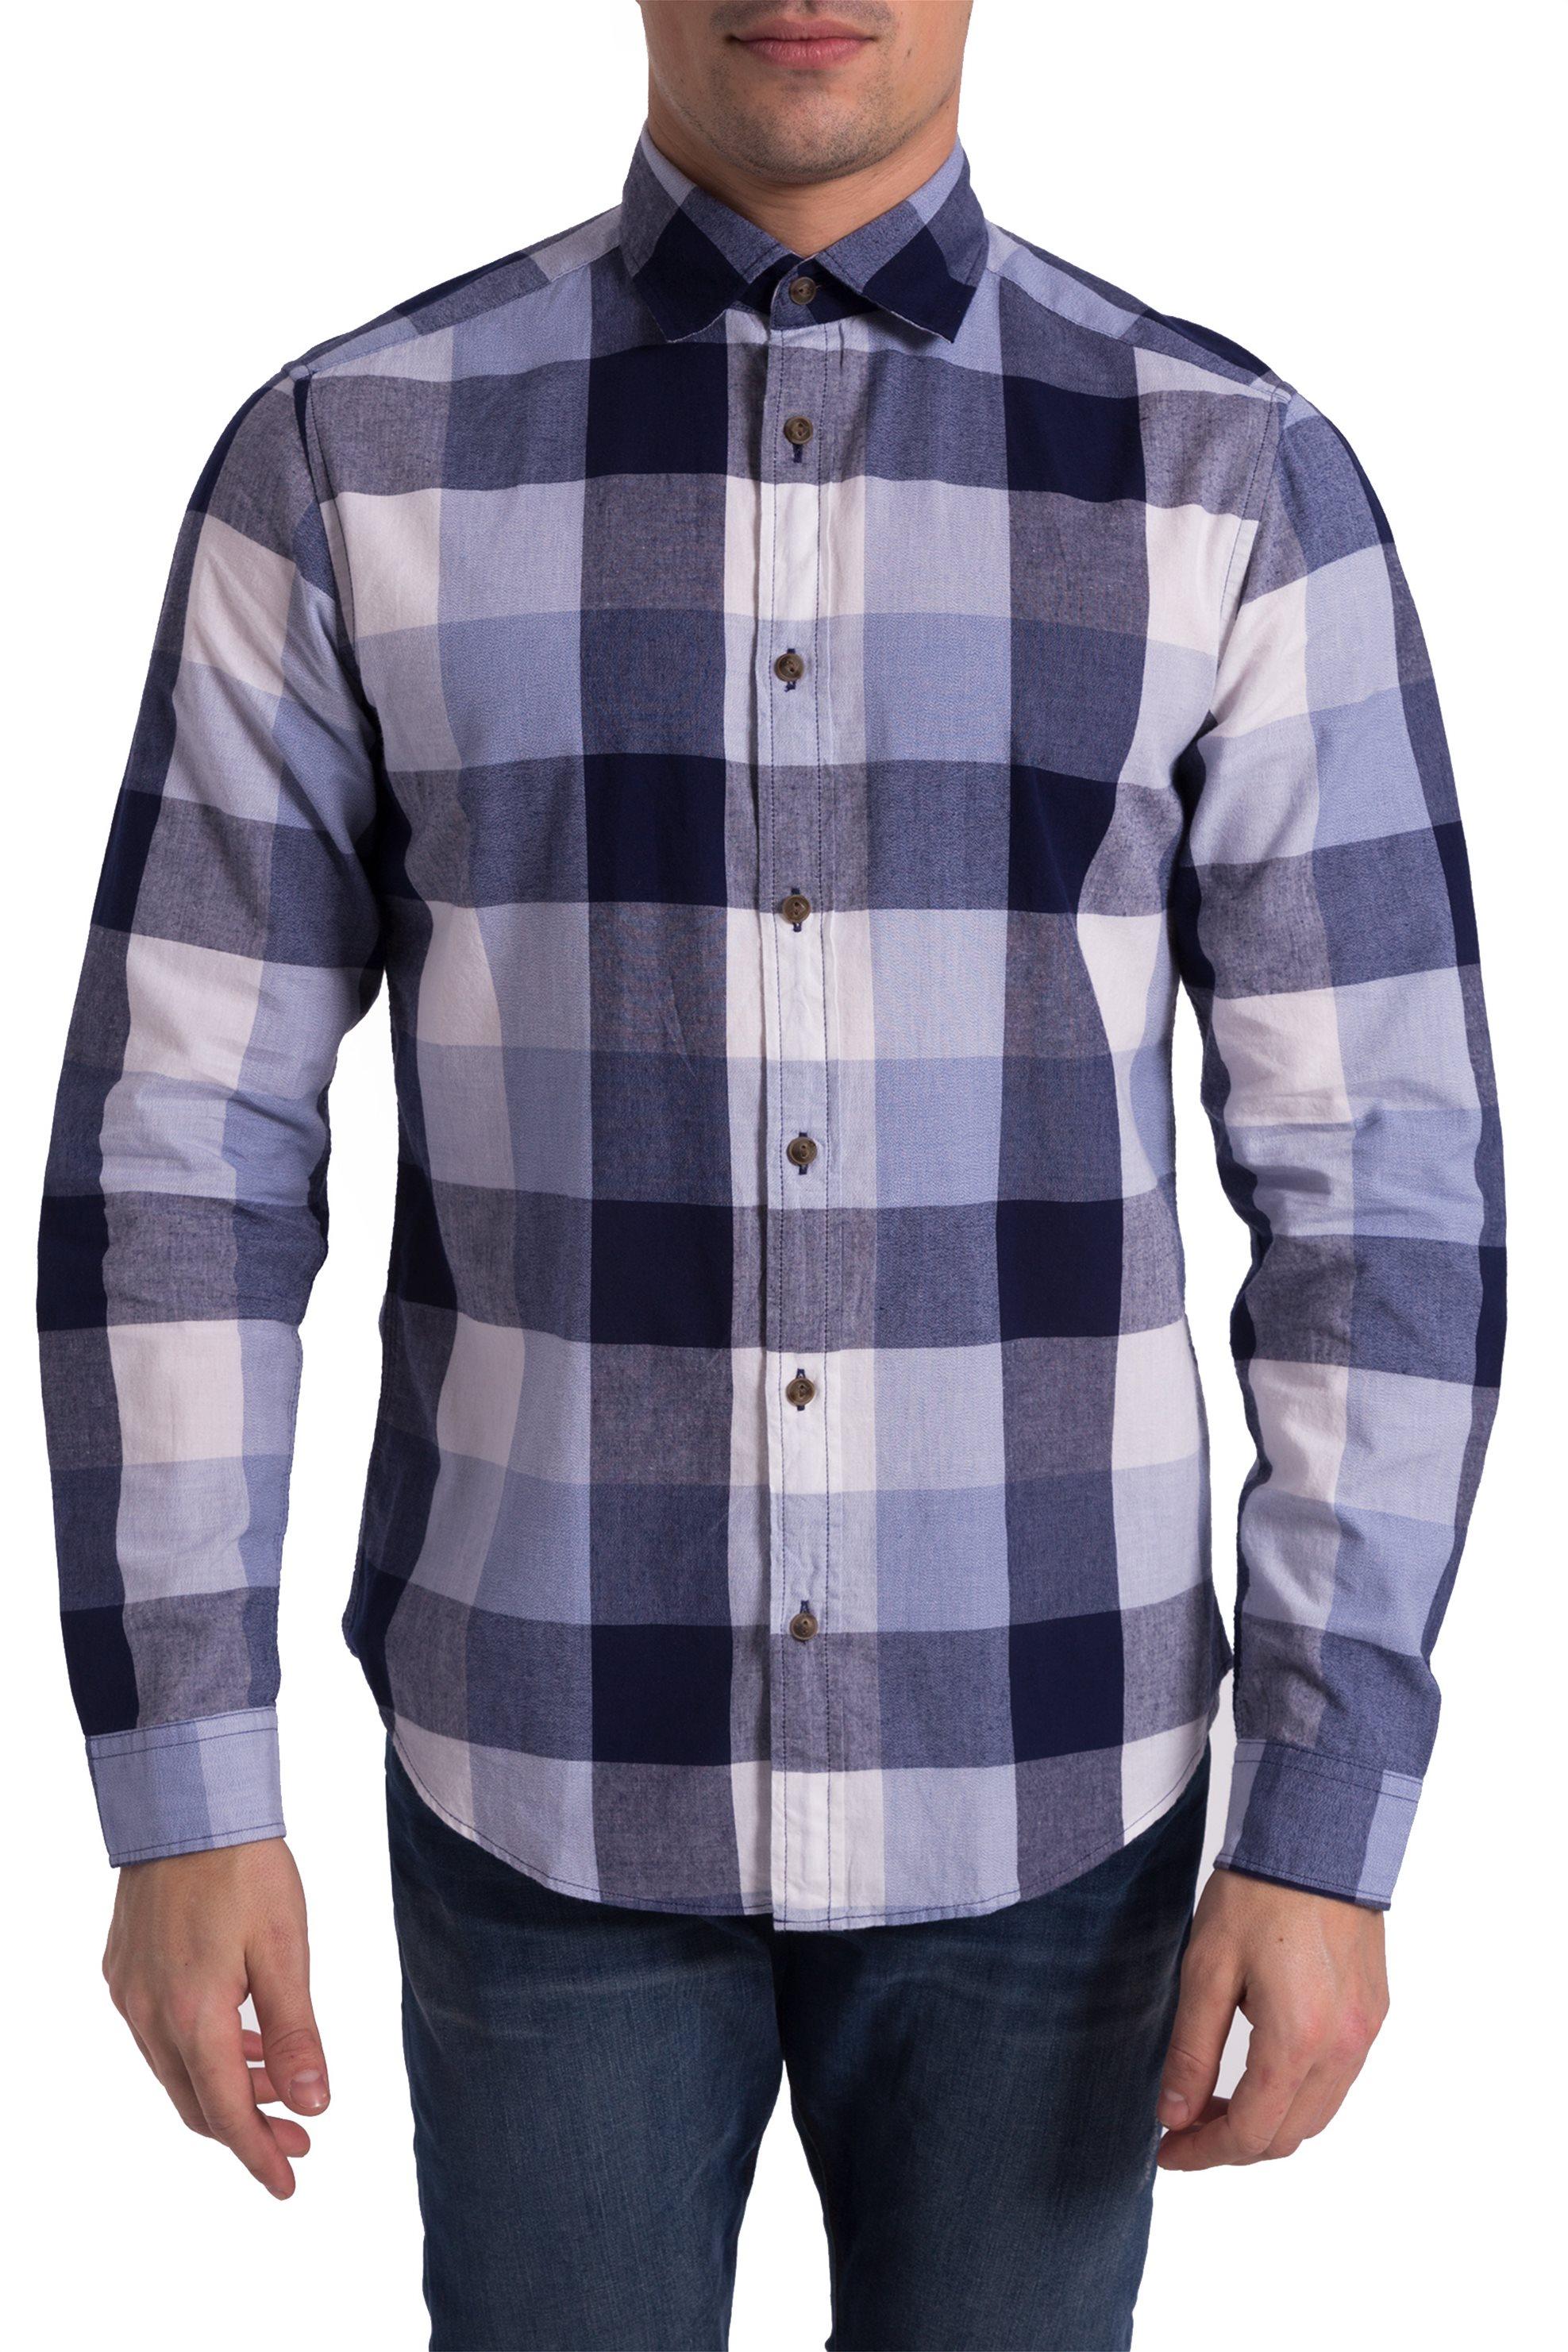 06564e312f4 Update / Βρεφικό καρό πουκάμισο Alouette - 00251180 - Γαλάζιο ...